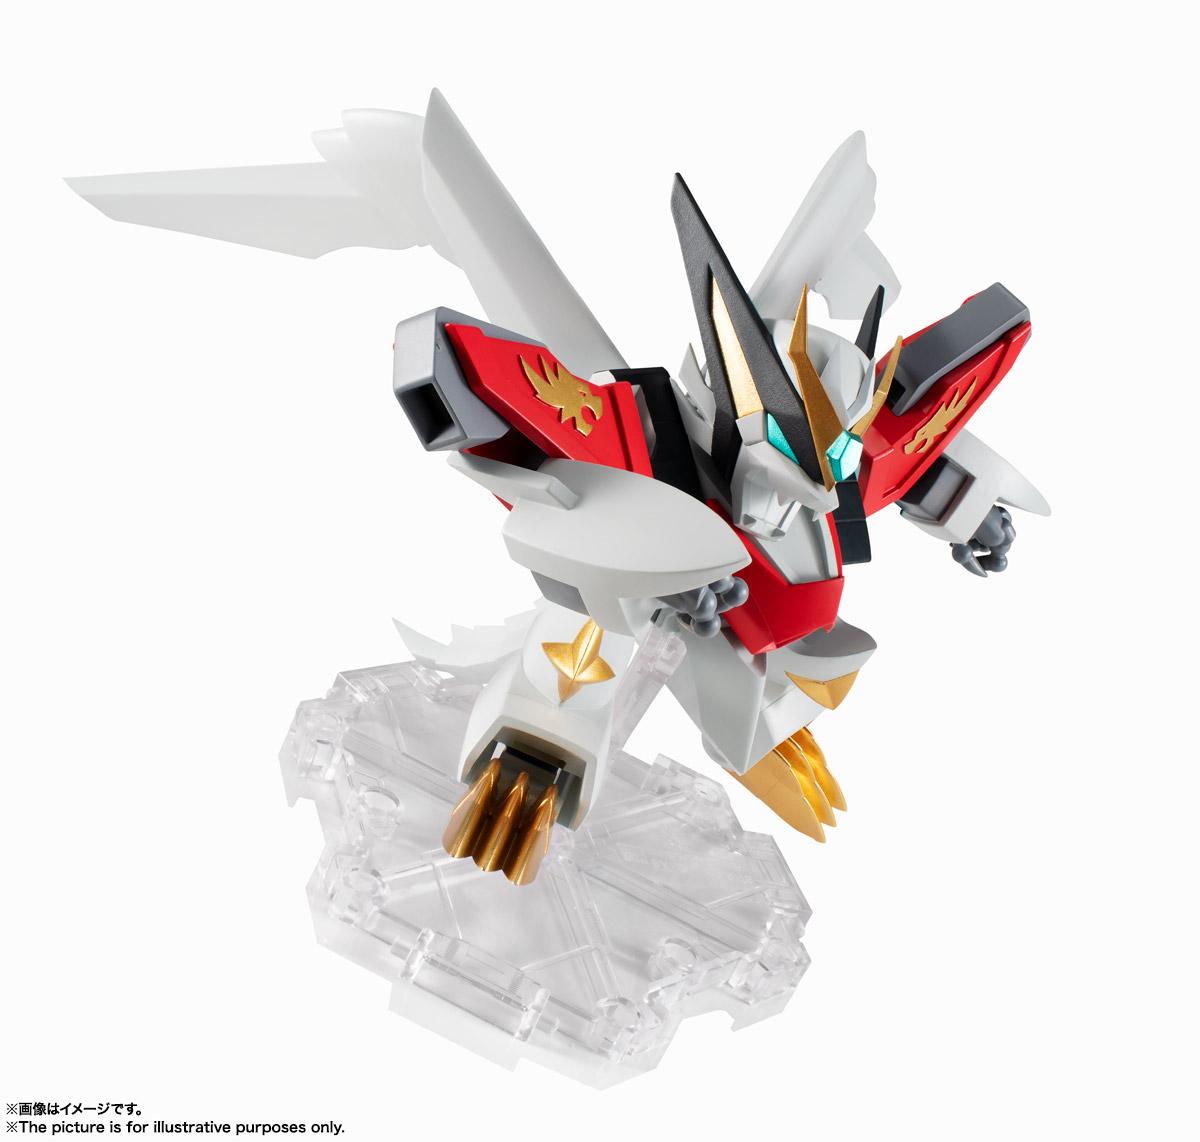 NXEDGE STYLE[MASHIN UNIT]『新星邪虎丸』魔神英雄伝ワタル2 可動フィギュア-005